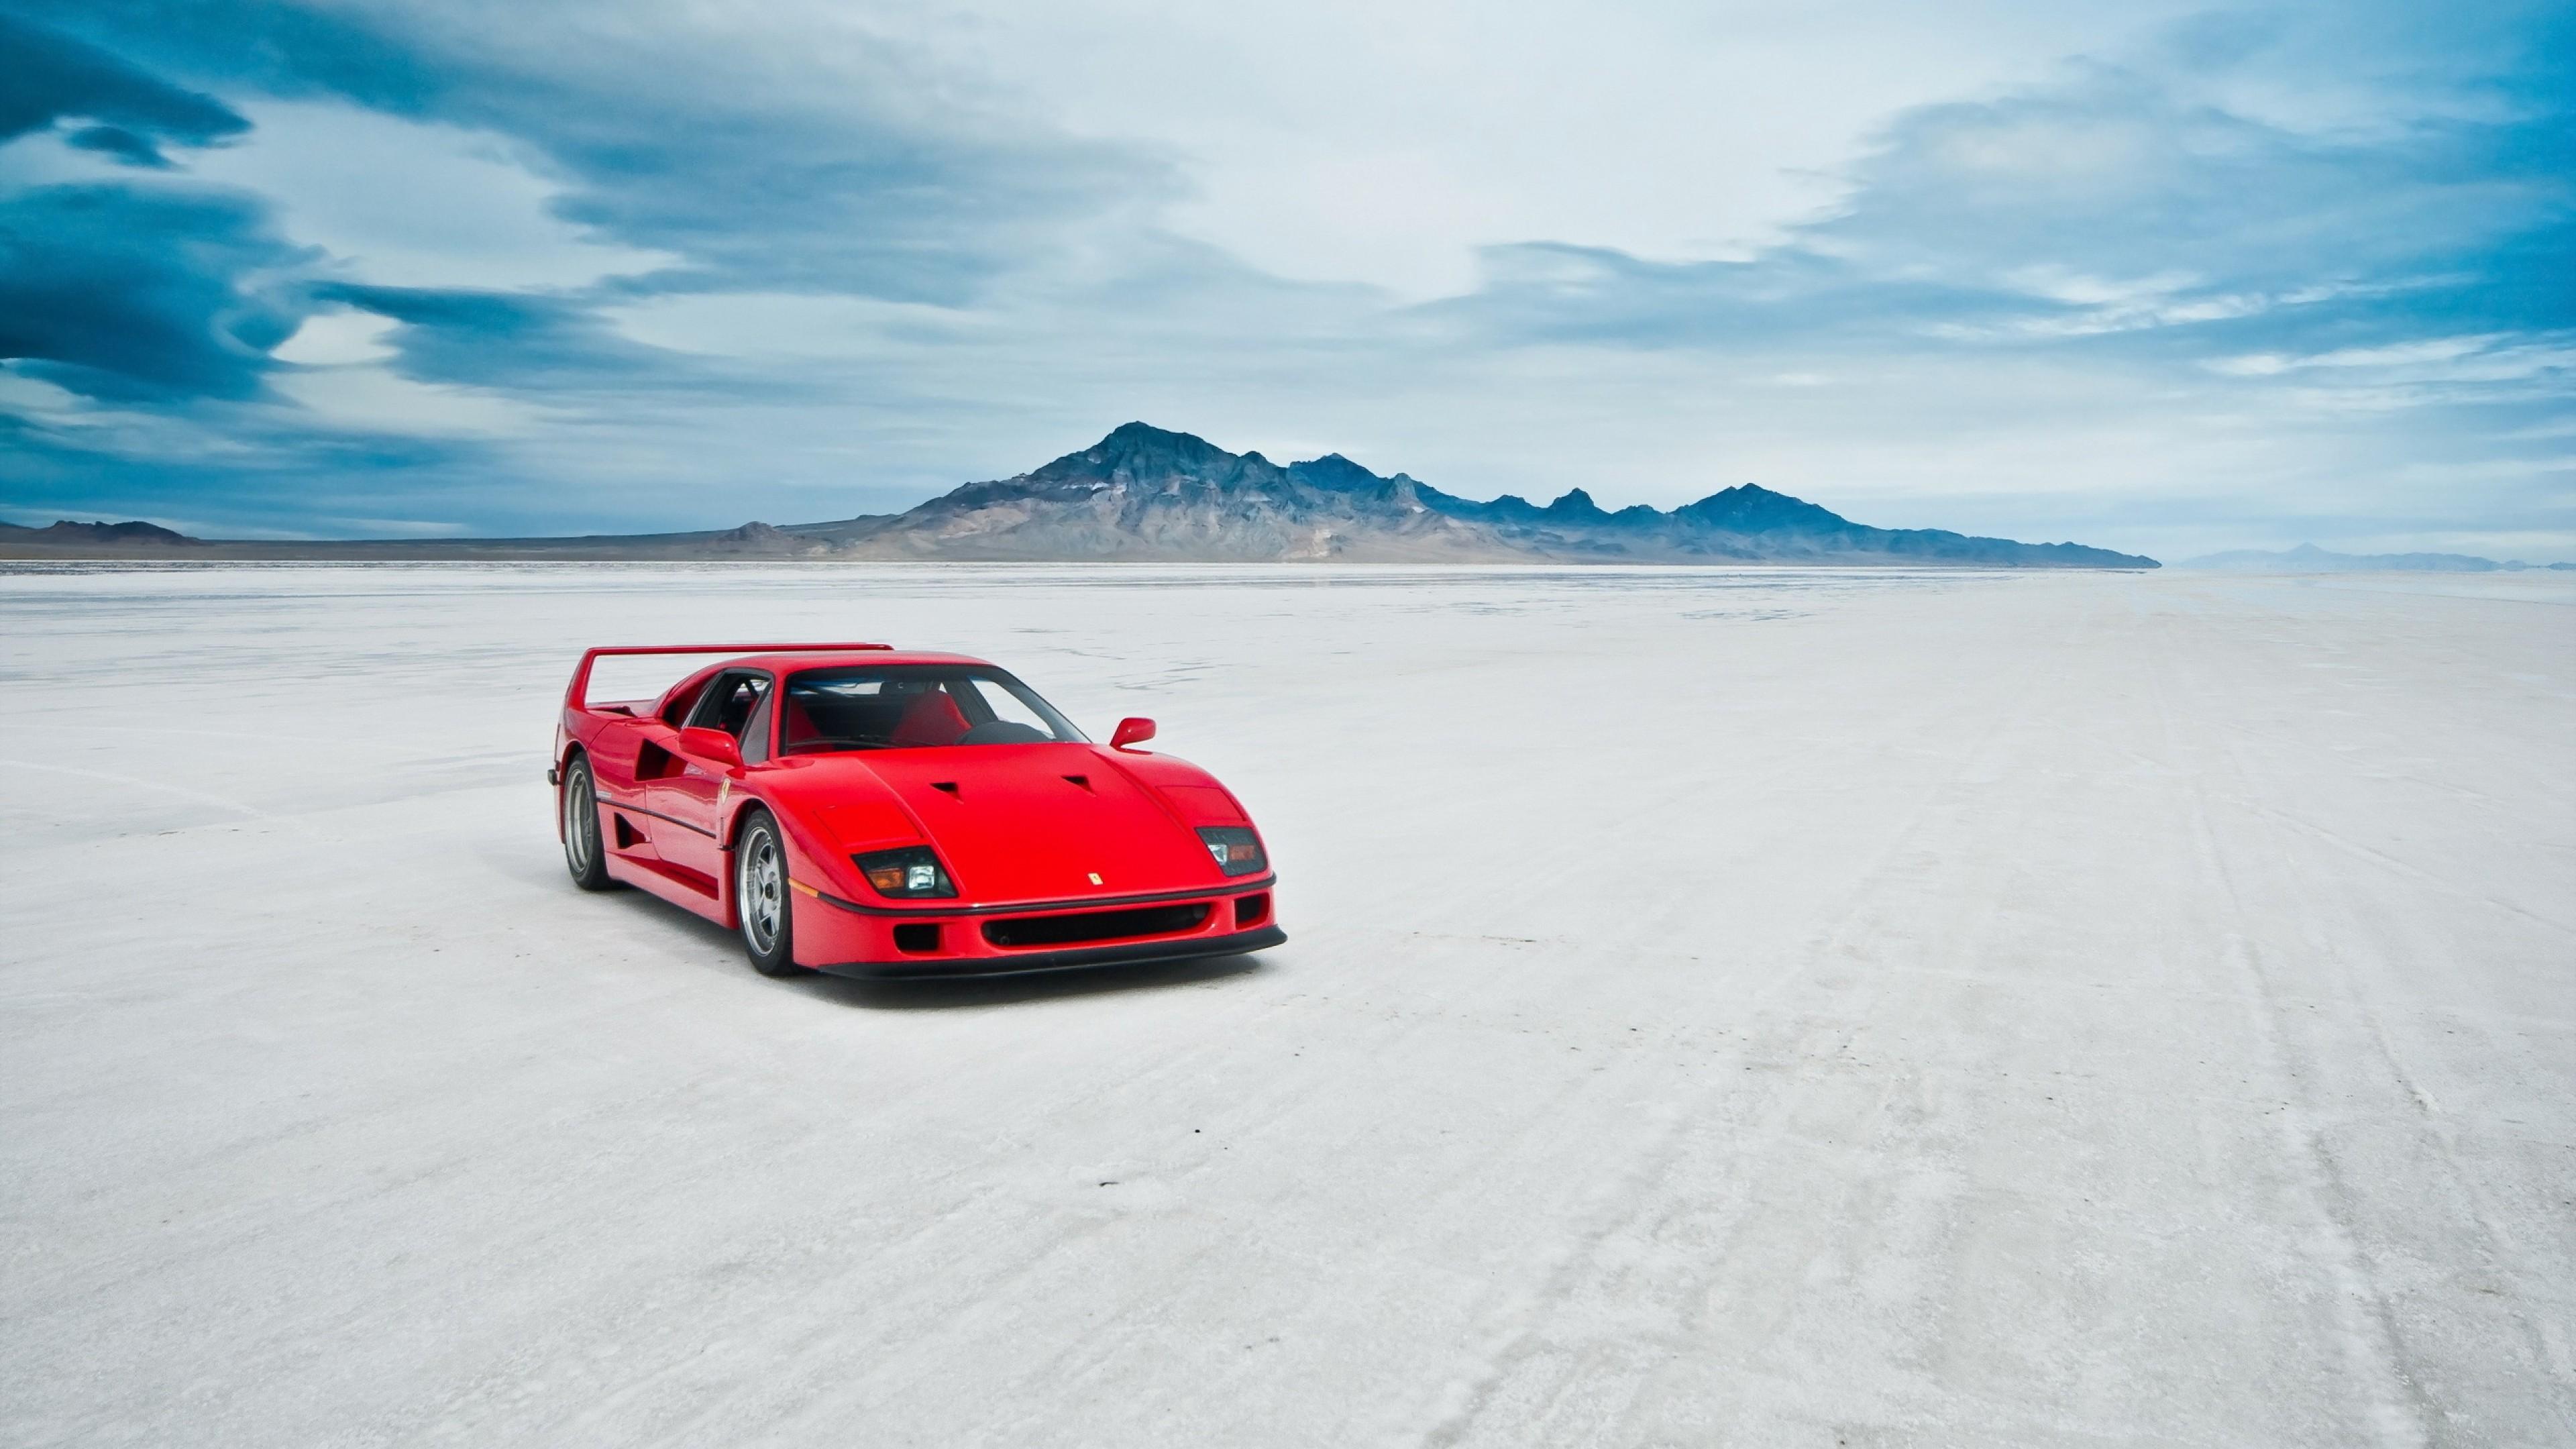 Download Wallpaper Ferrari F40, Lake, Machine 4K Ultra .